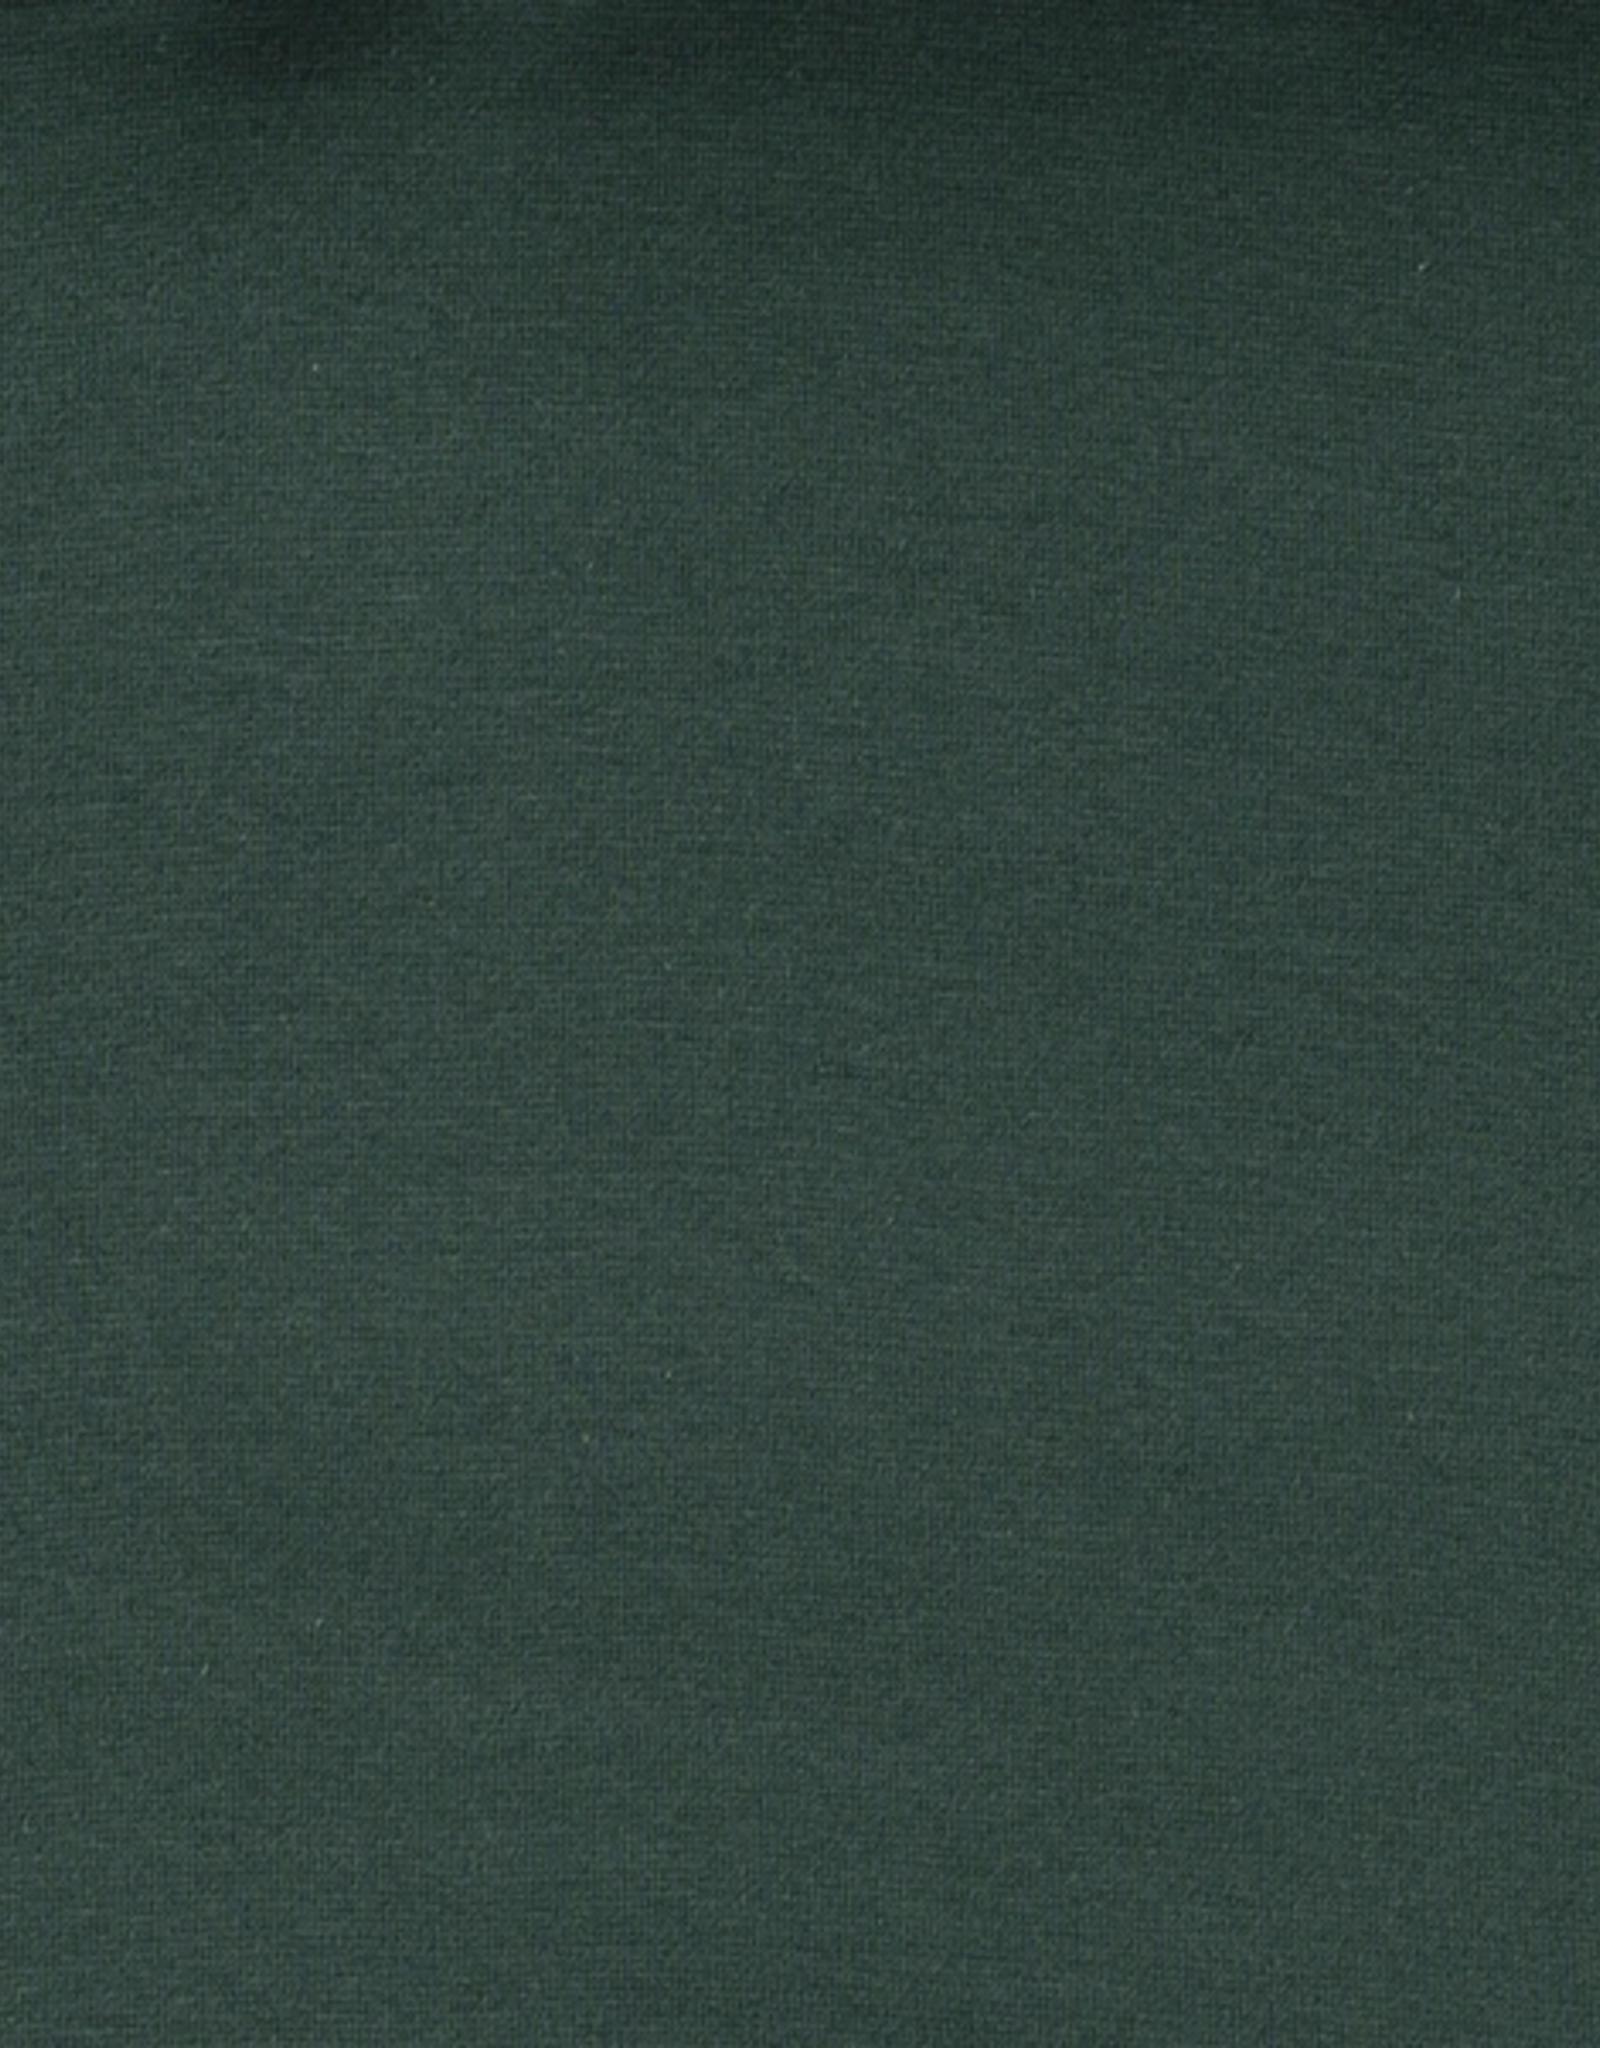 Boordstof - Donker Groen